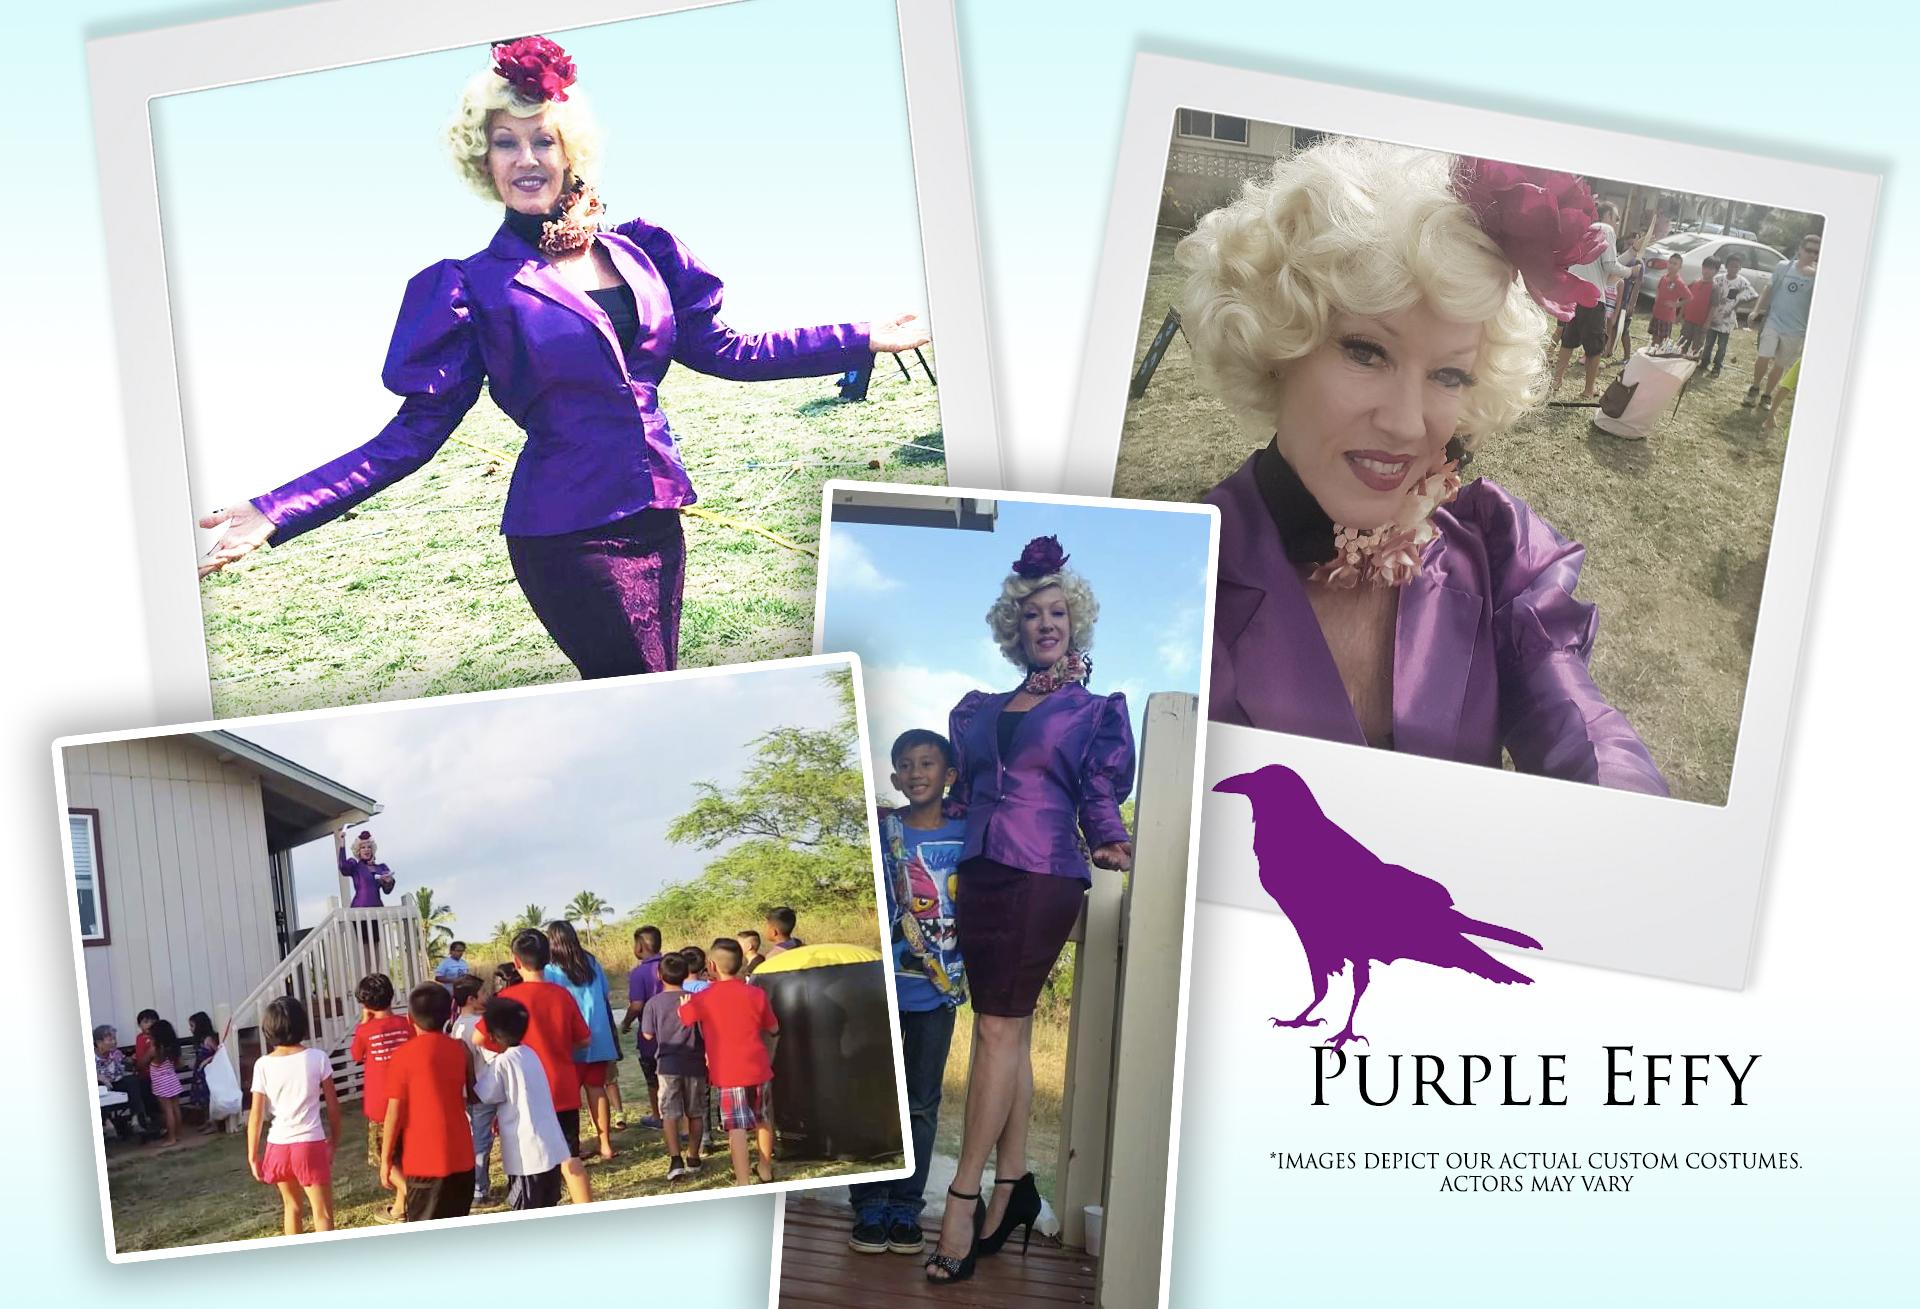 Purple Effy